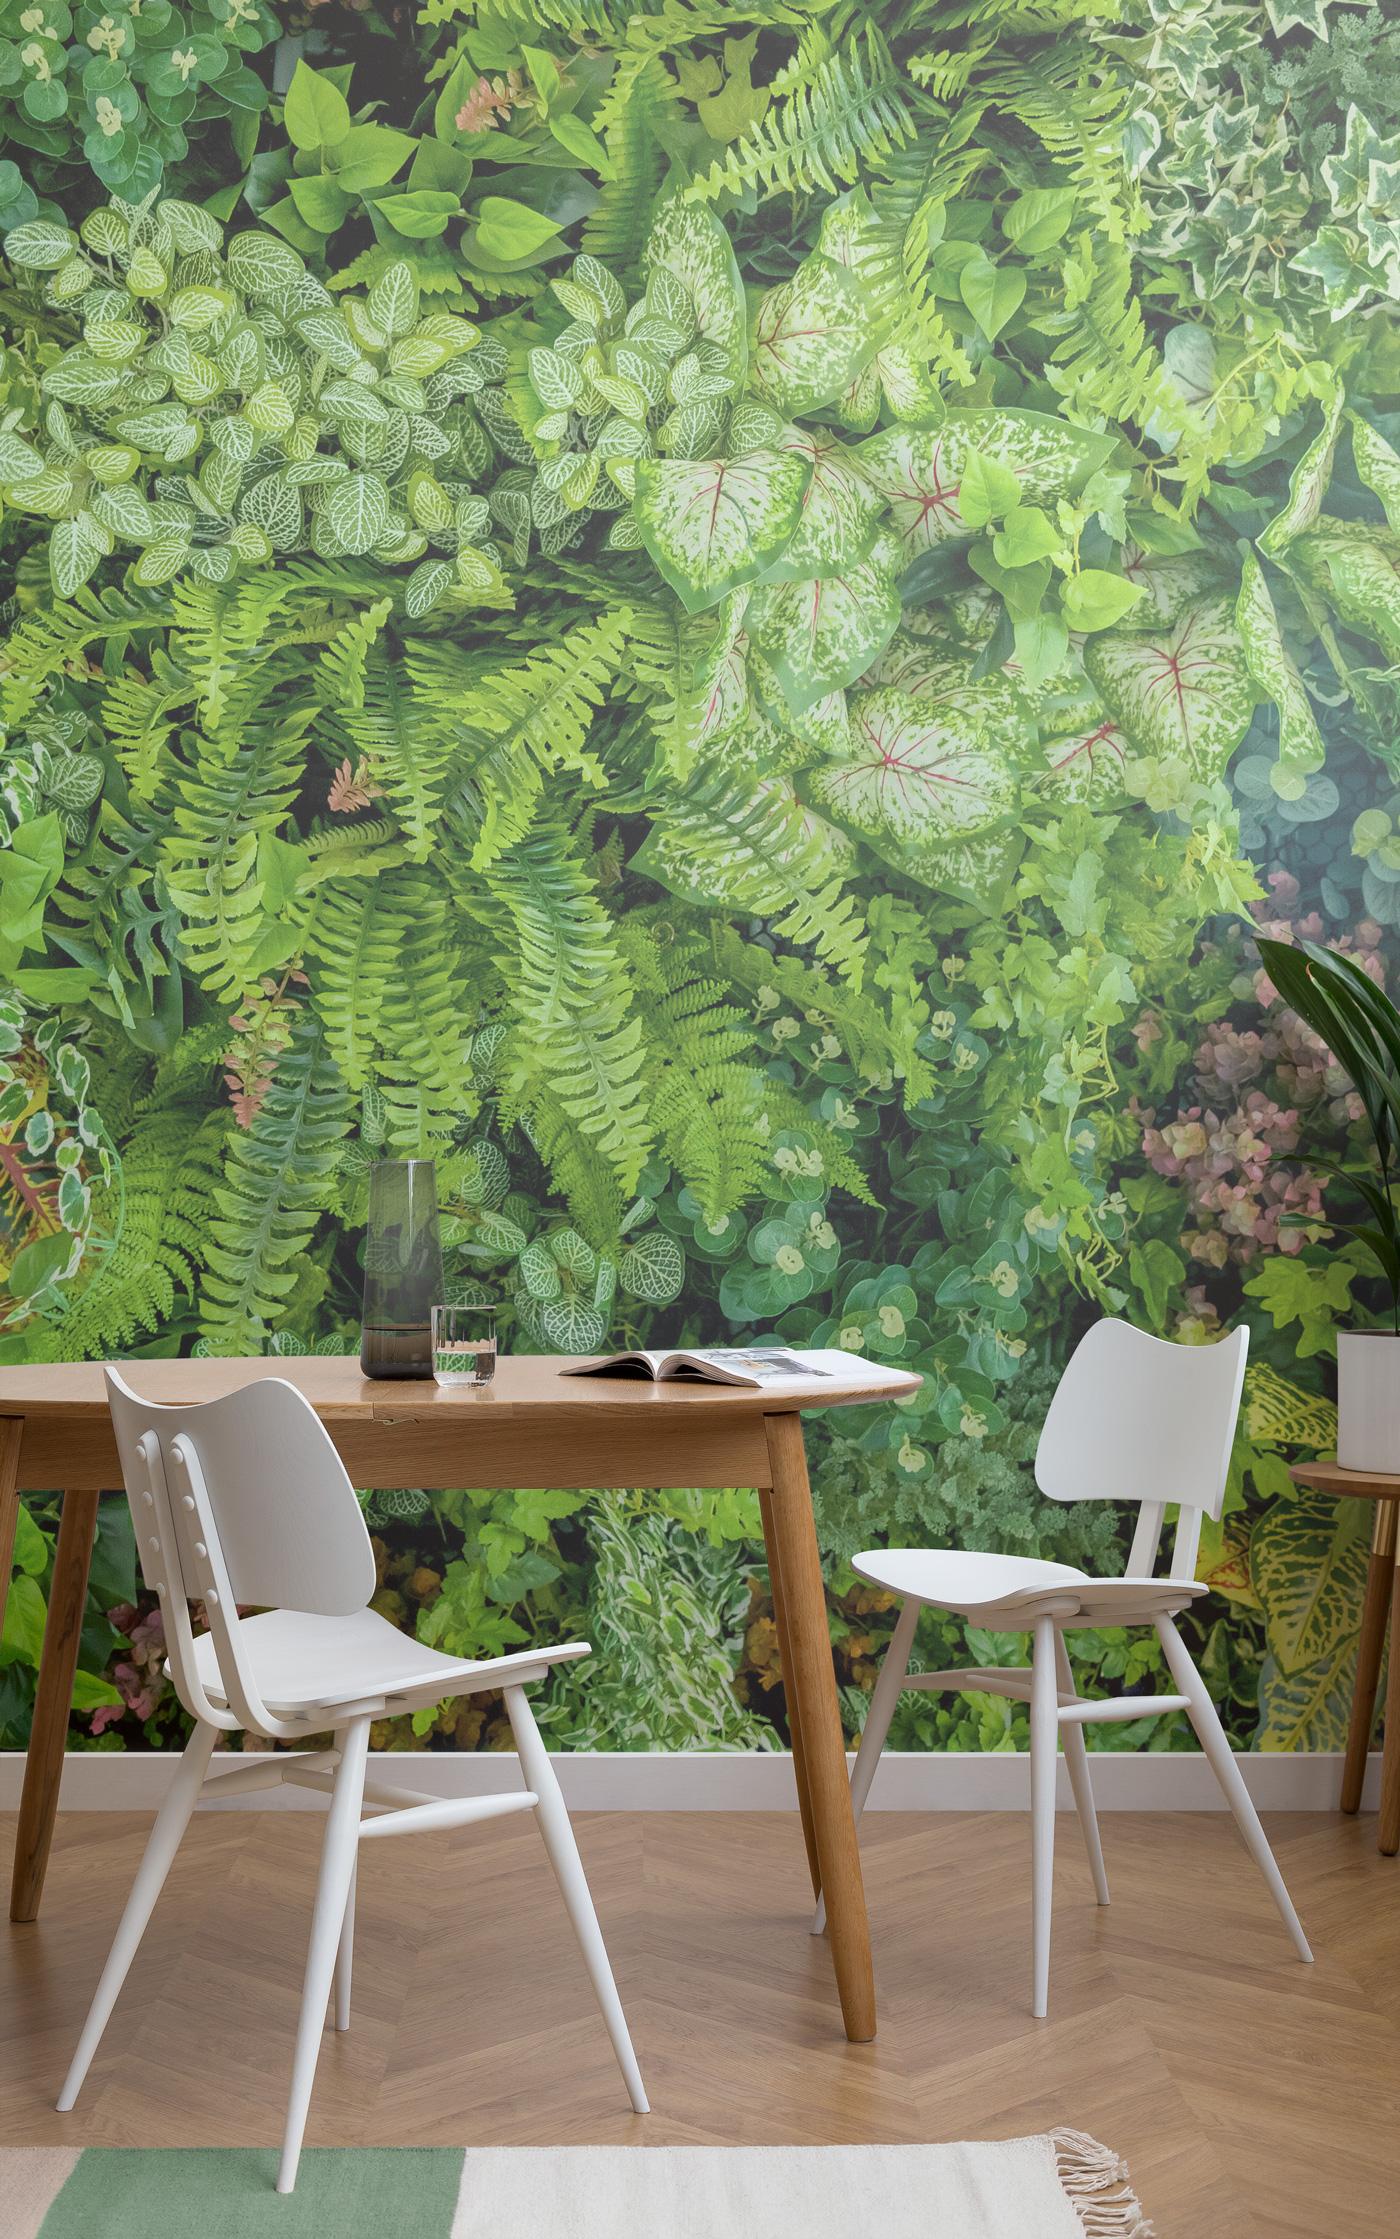 Vertical-Gardens-4-Lifestyle-Web.jpg